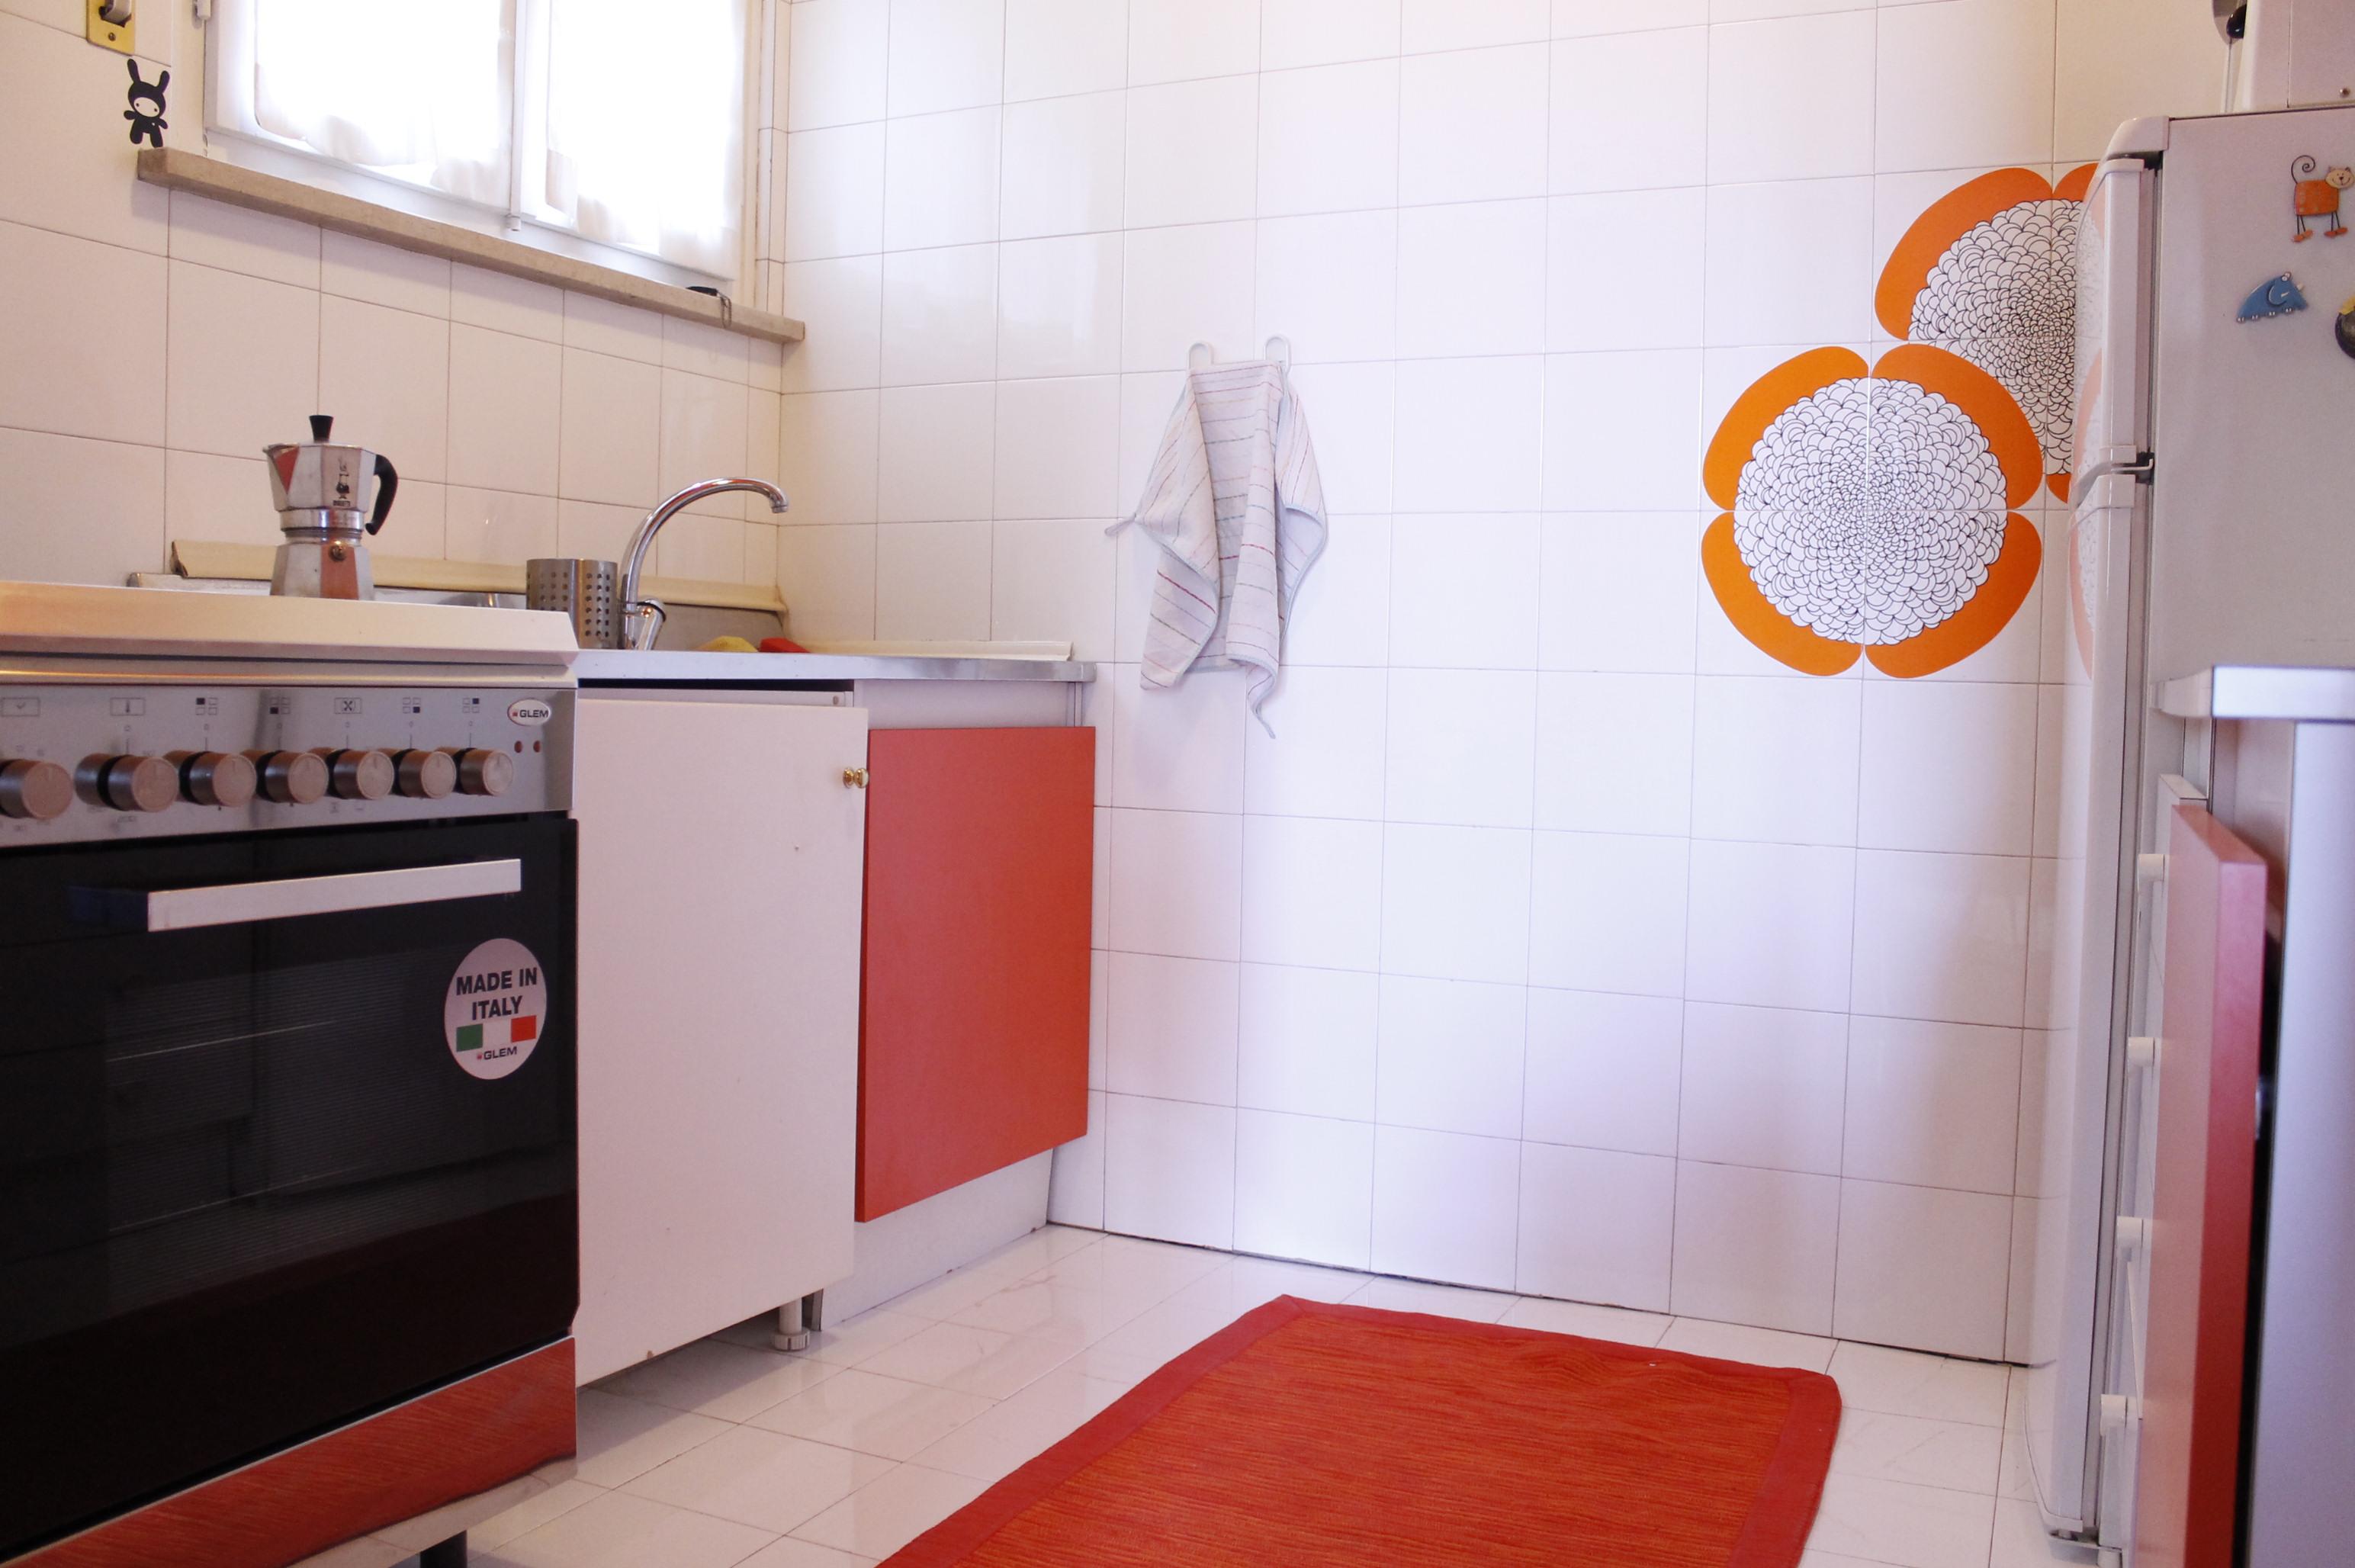 cucina appartamento red rose in centro a Verona